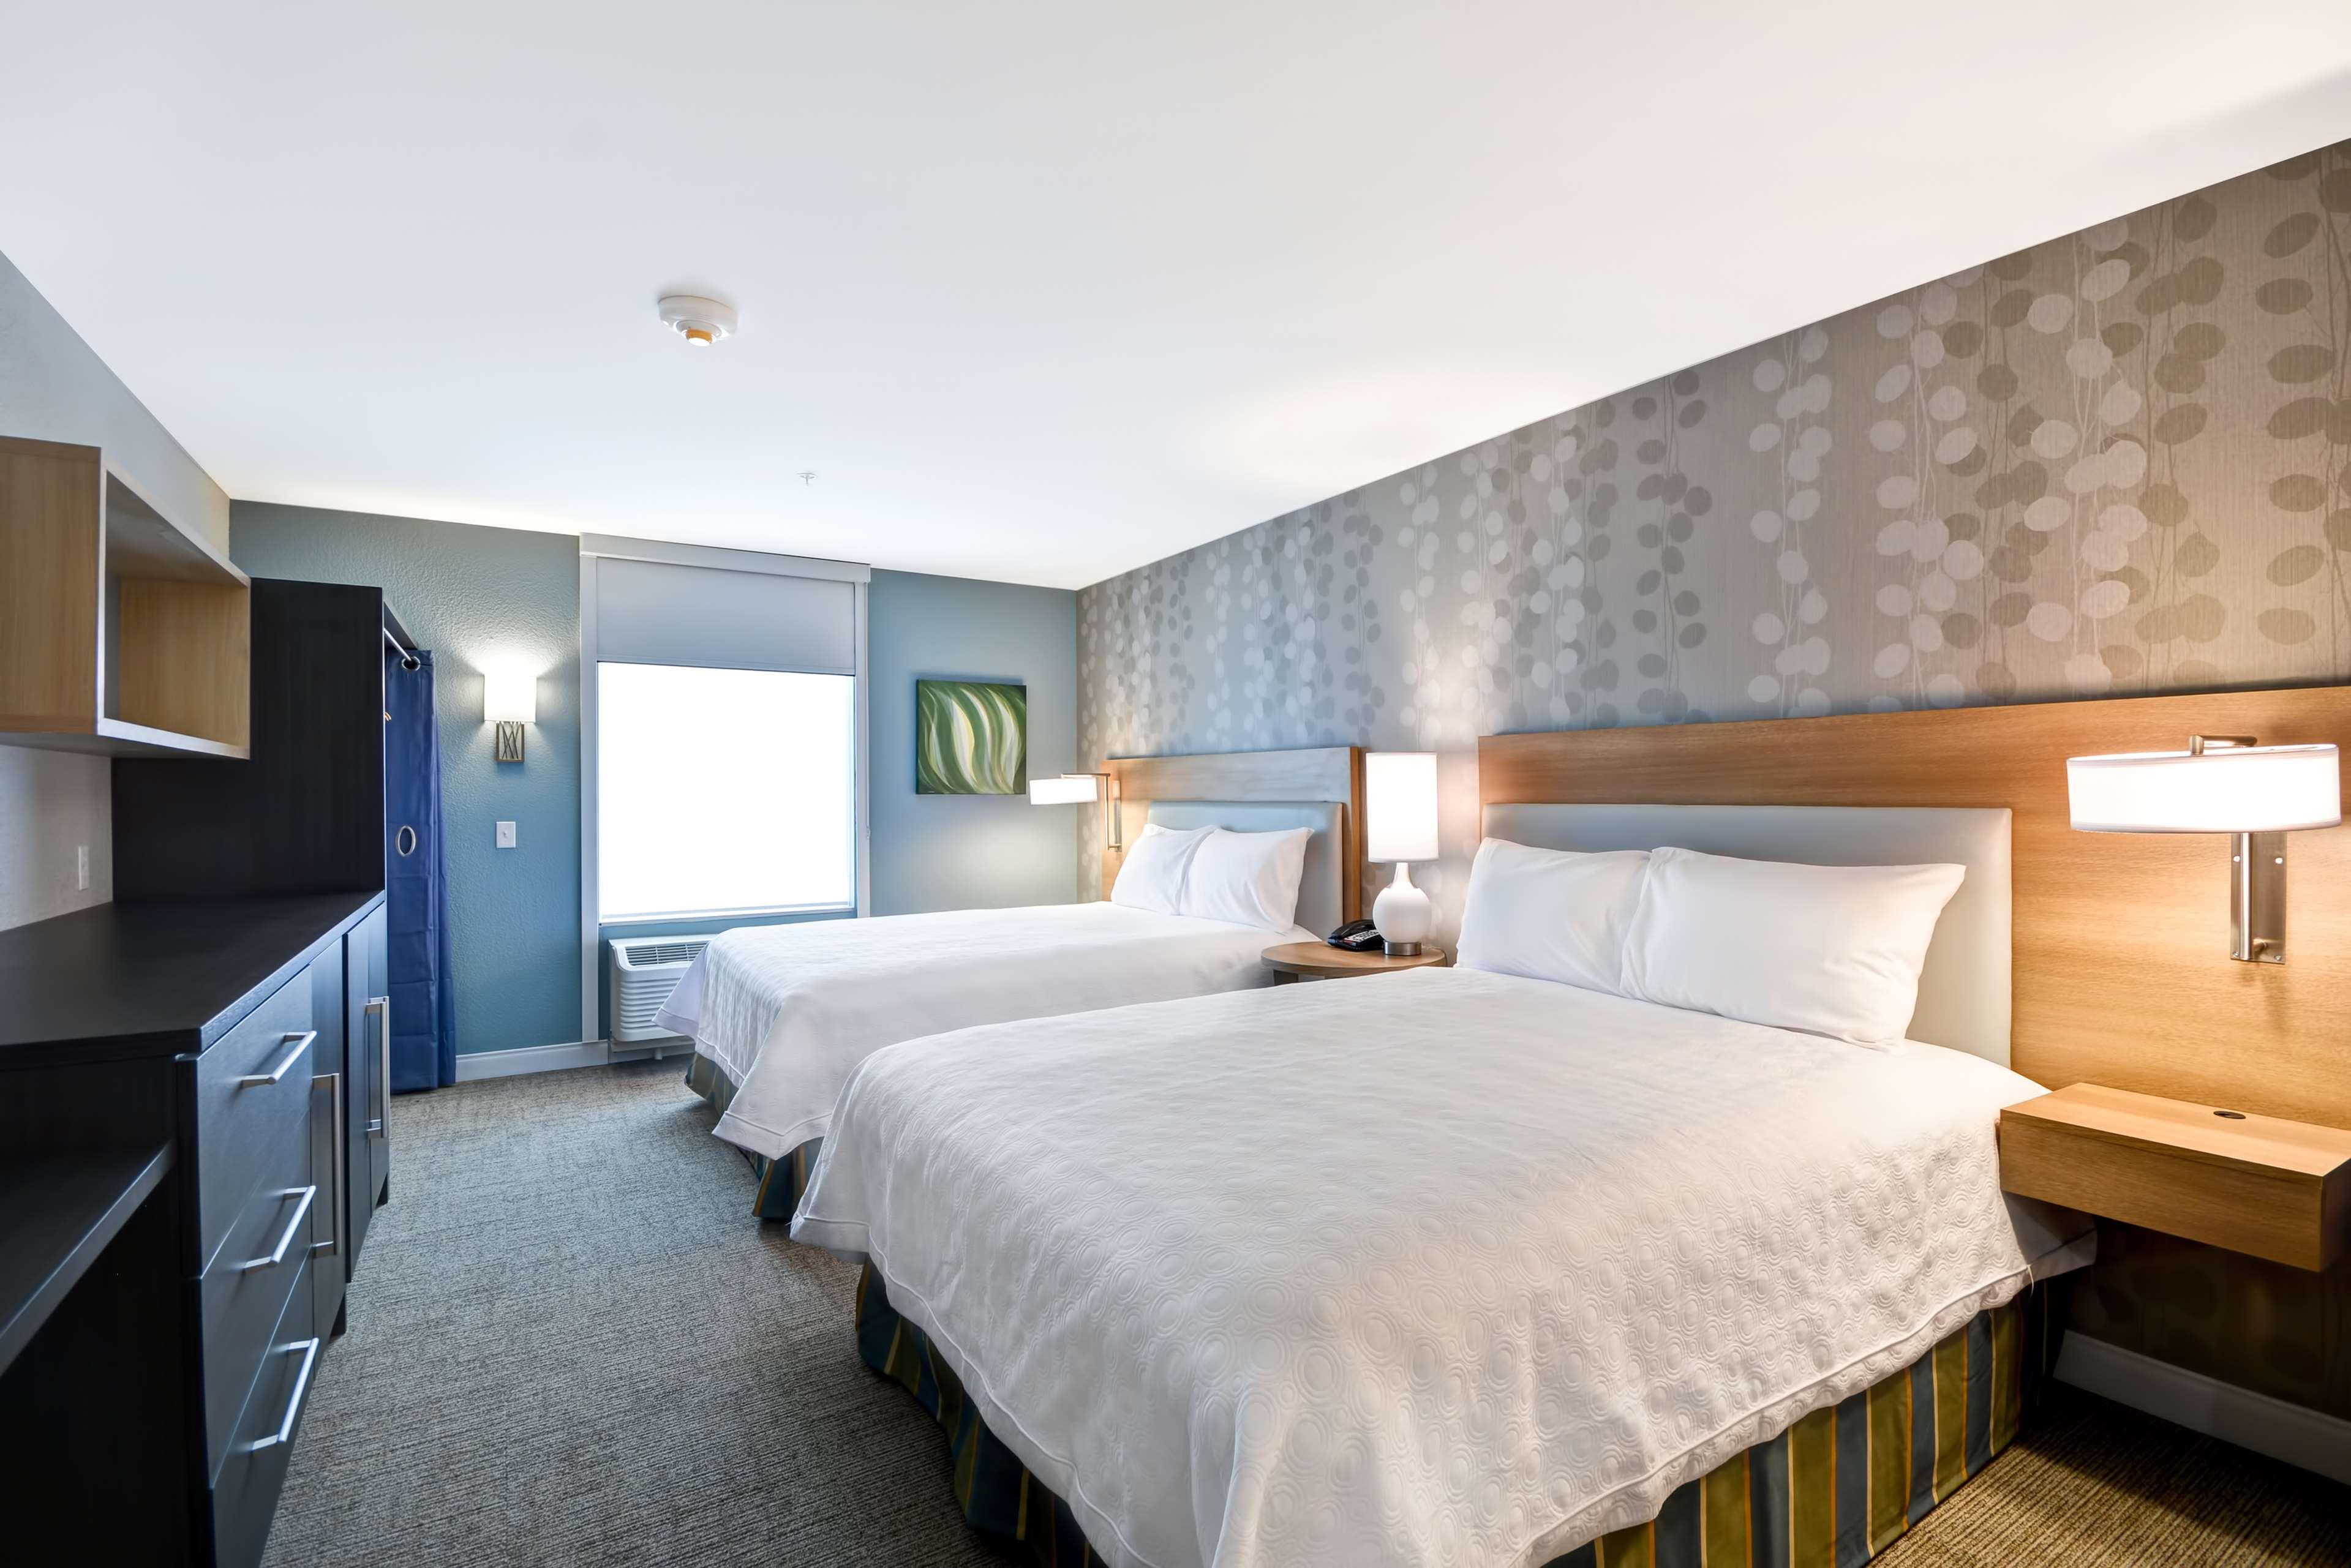 Home2 Suites by Hilton Jackson image 21